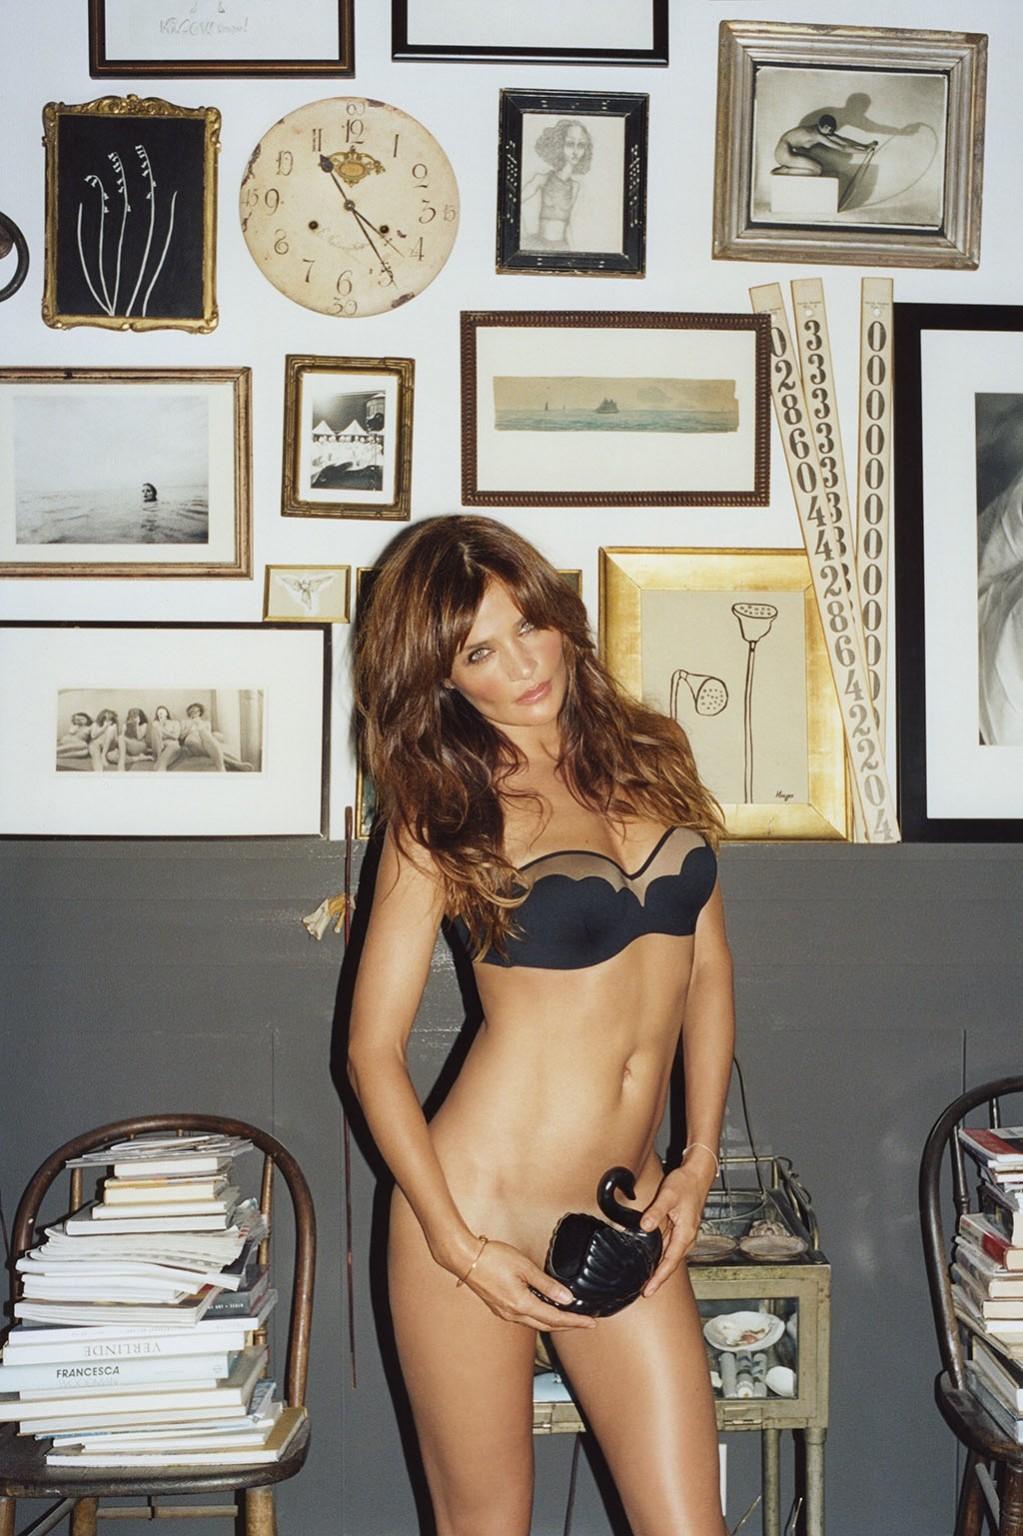 http://1.bp.blogspot.com/--_tXZOzawfM/Ud_Iq7yynJI/AAAAAAABIBk/nQor11gvXIE/s1600/Helena+Christensen+Fully-Naked-For+FutureClaw.jpg